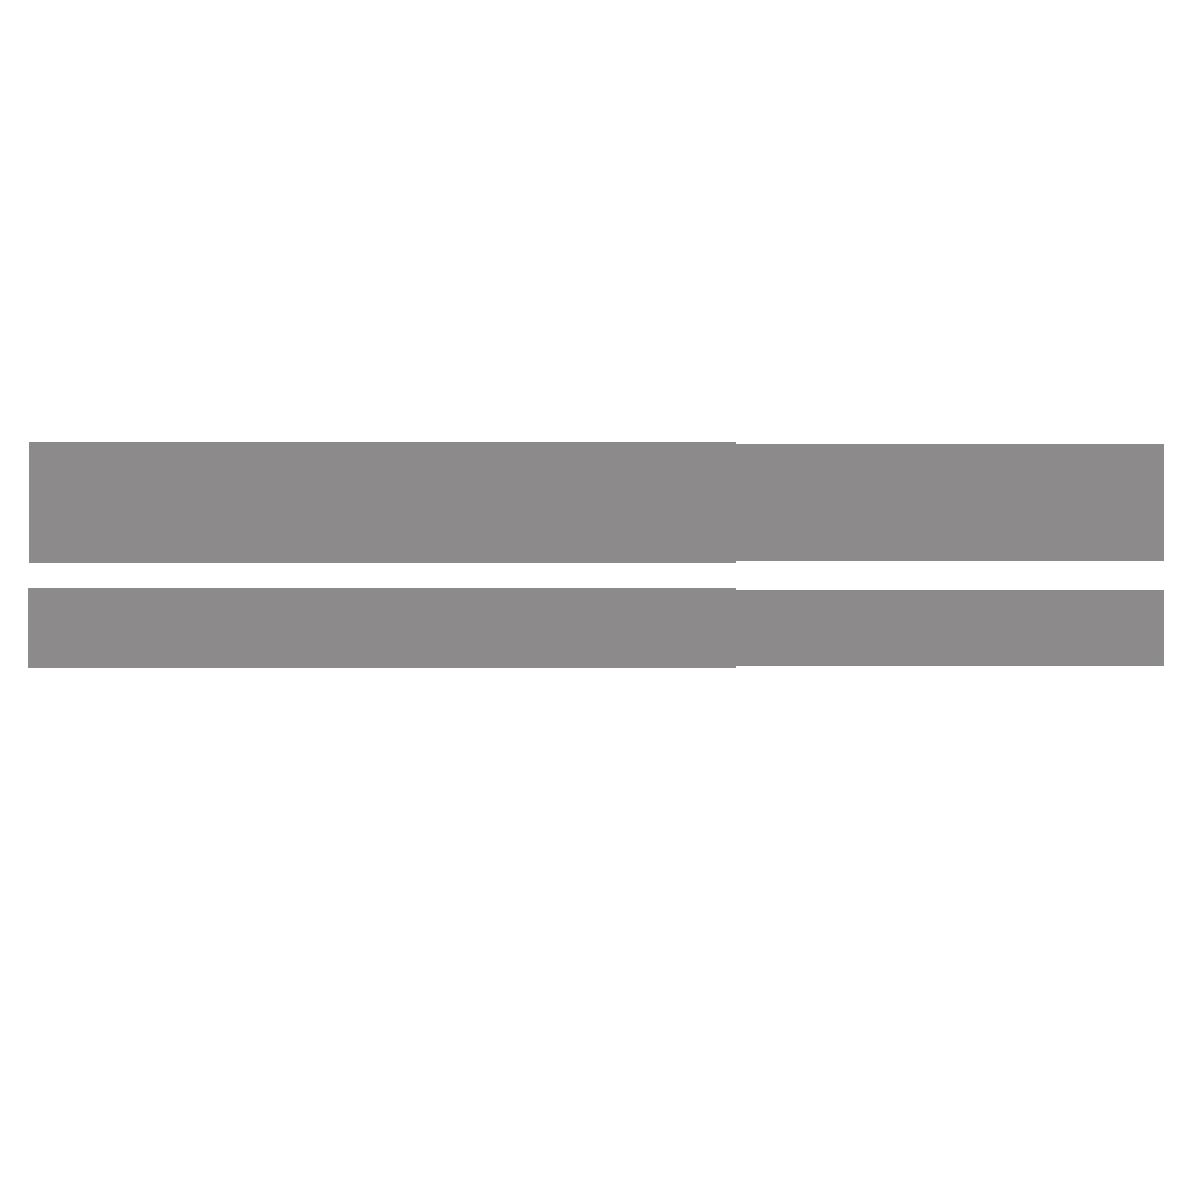 Alok Sardana